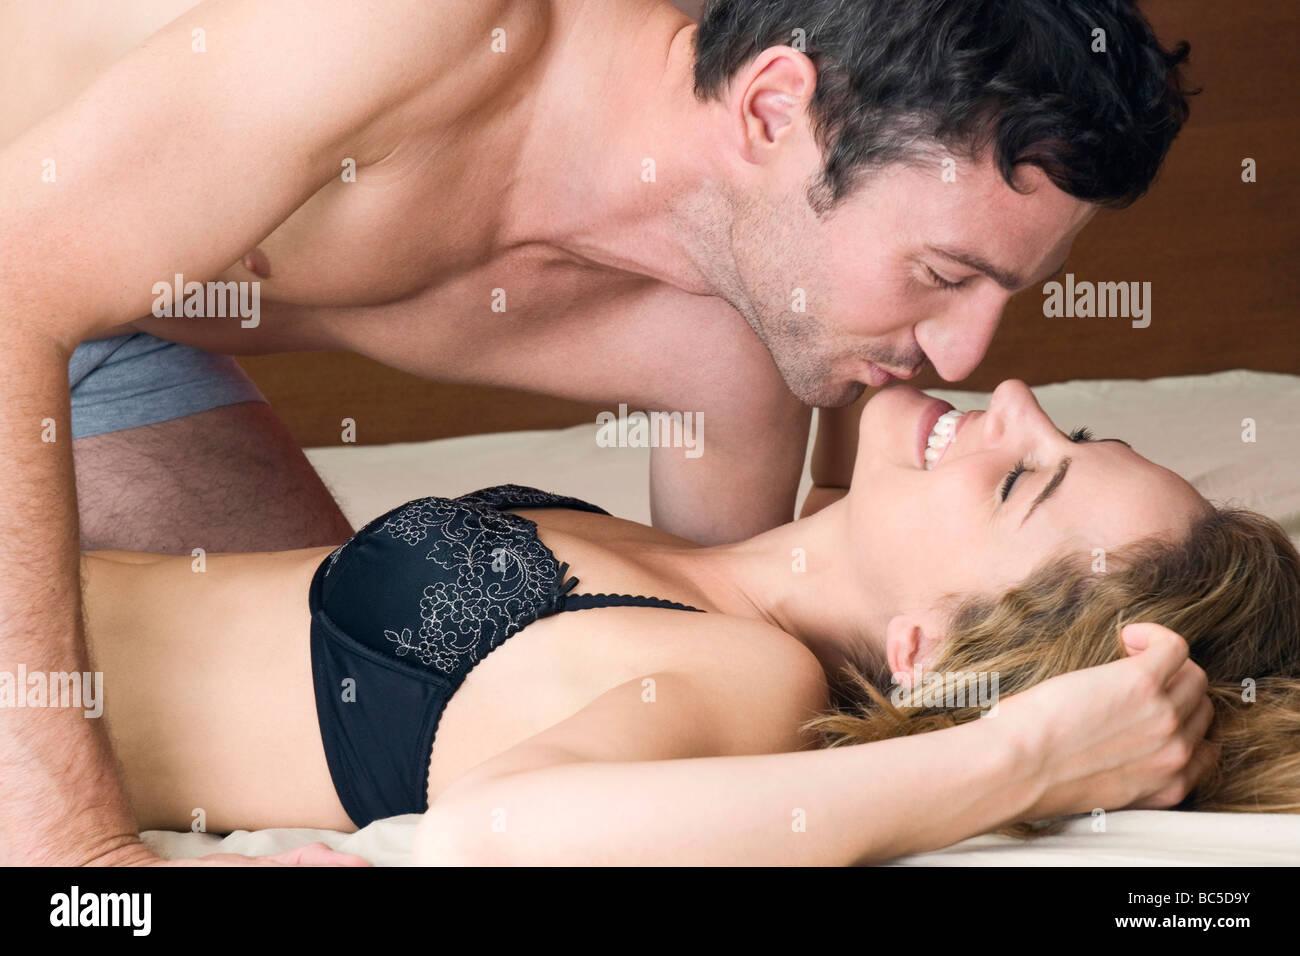 Agnes Real Teens Kissing 39